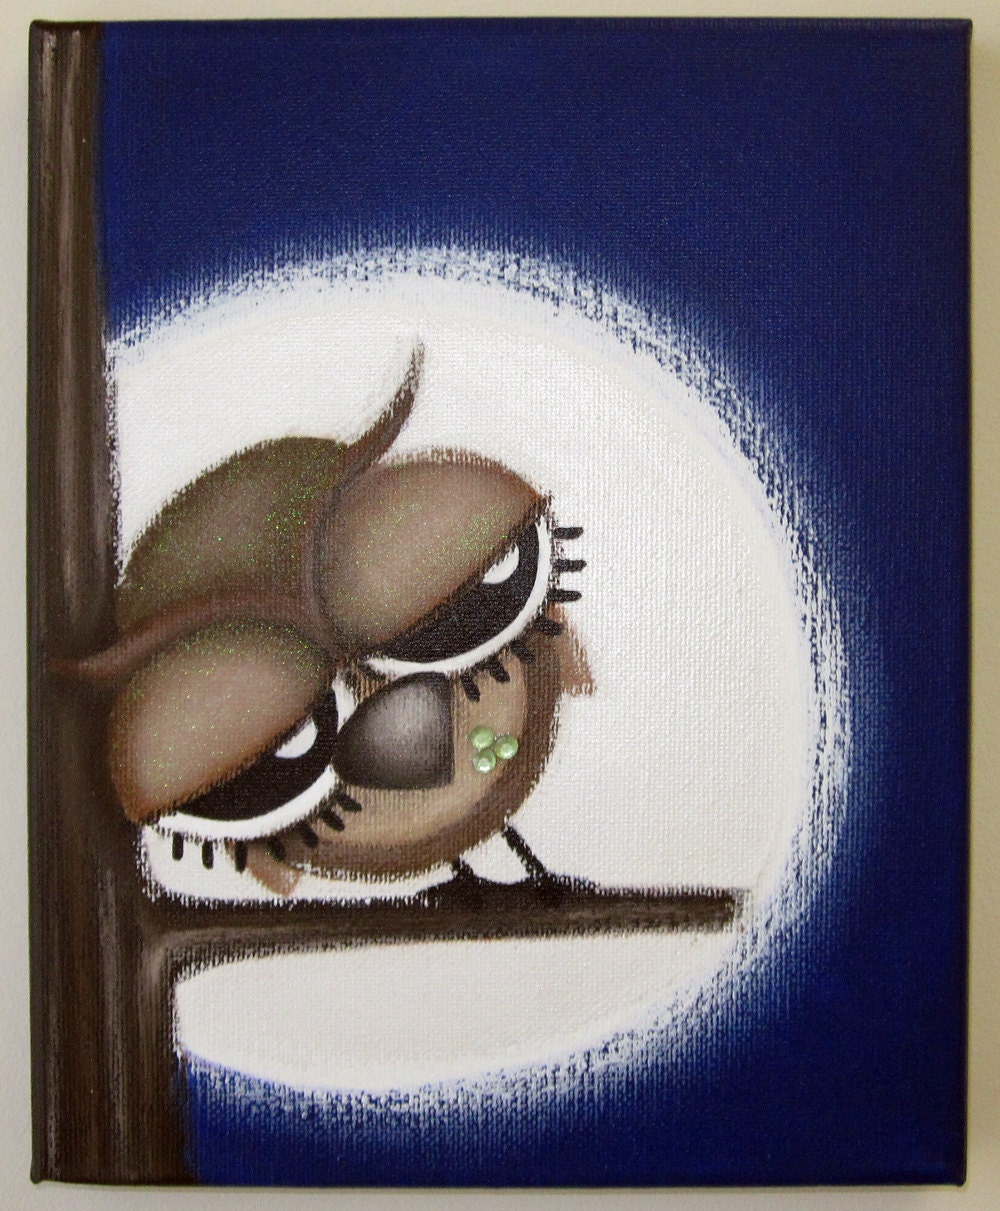 sLeePy oWL 8x10 original painting on canvas by art4barewalls - photo#33